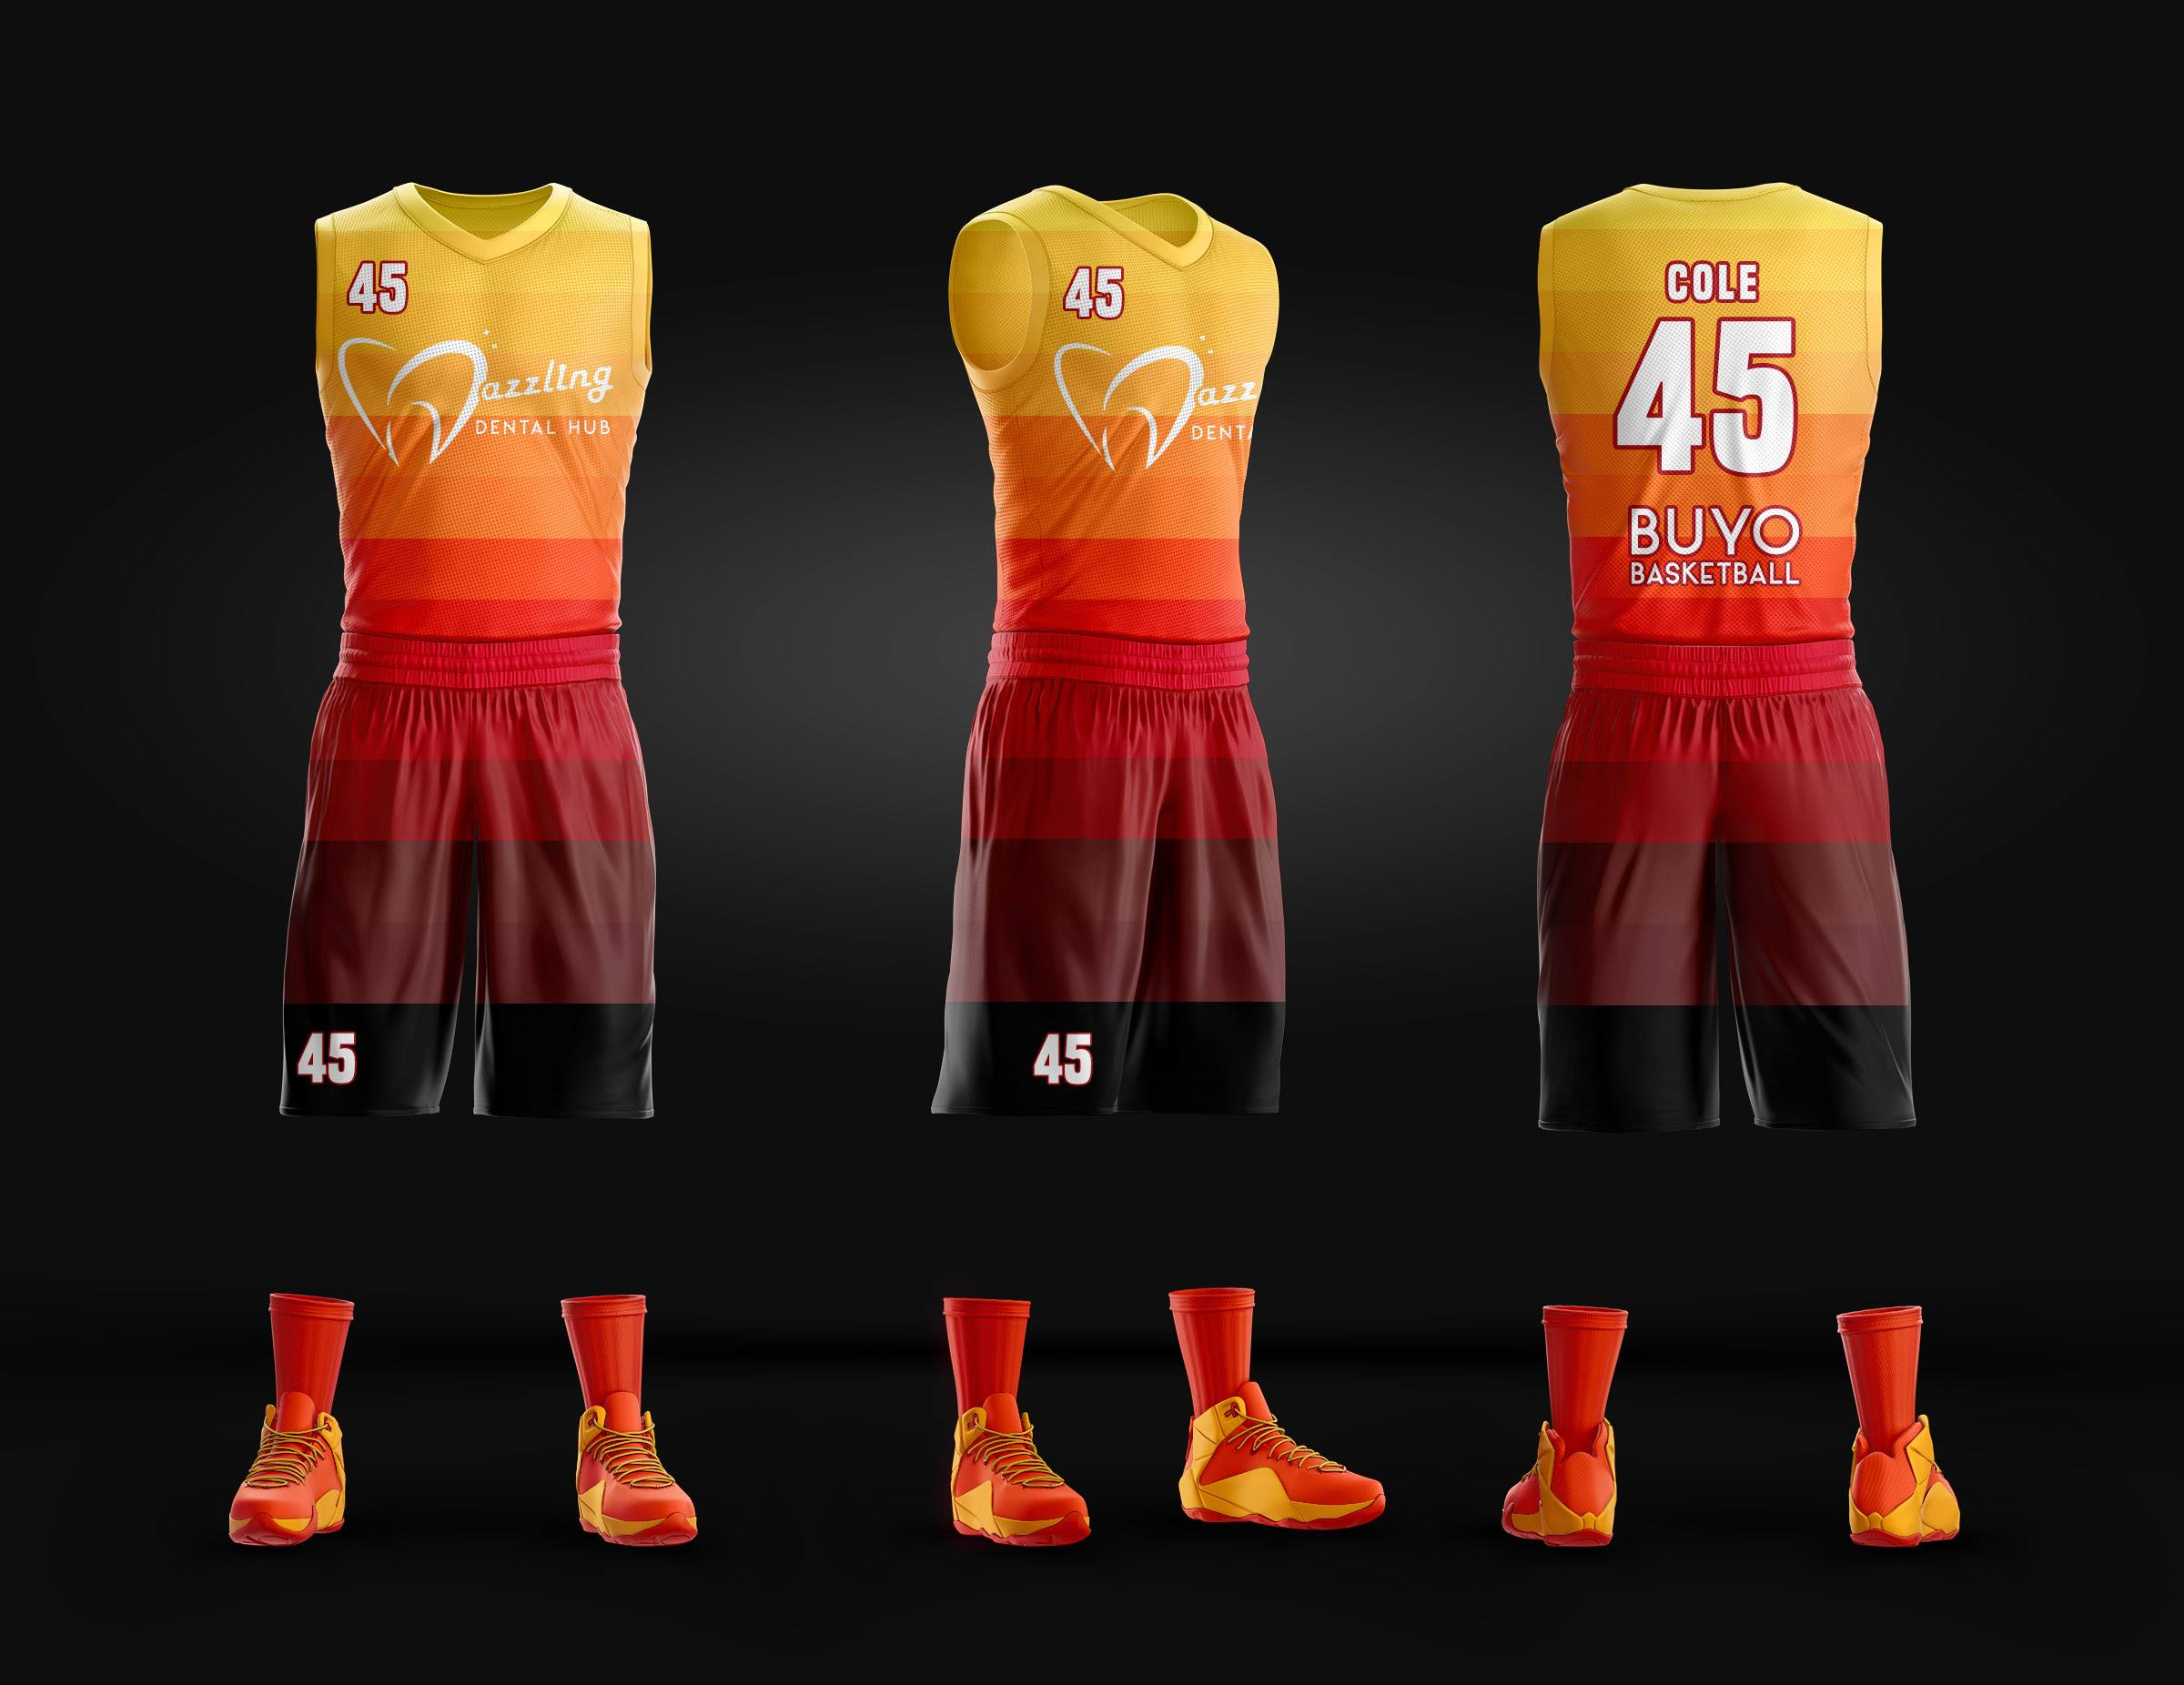 b92e8a5cfc5 Buyo Full Sublimation Basketball Jersey – Philiprint